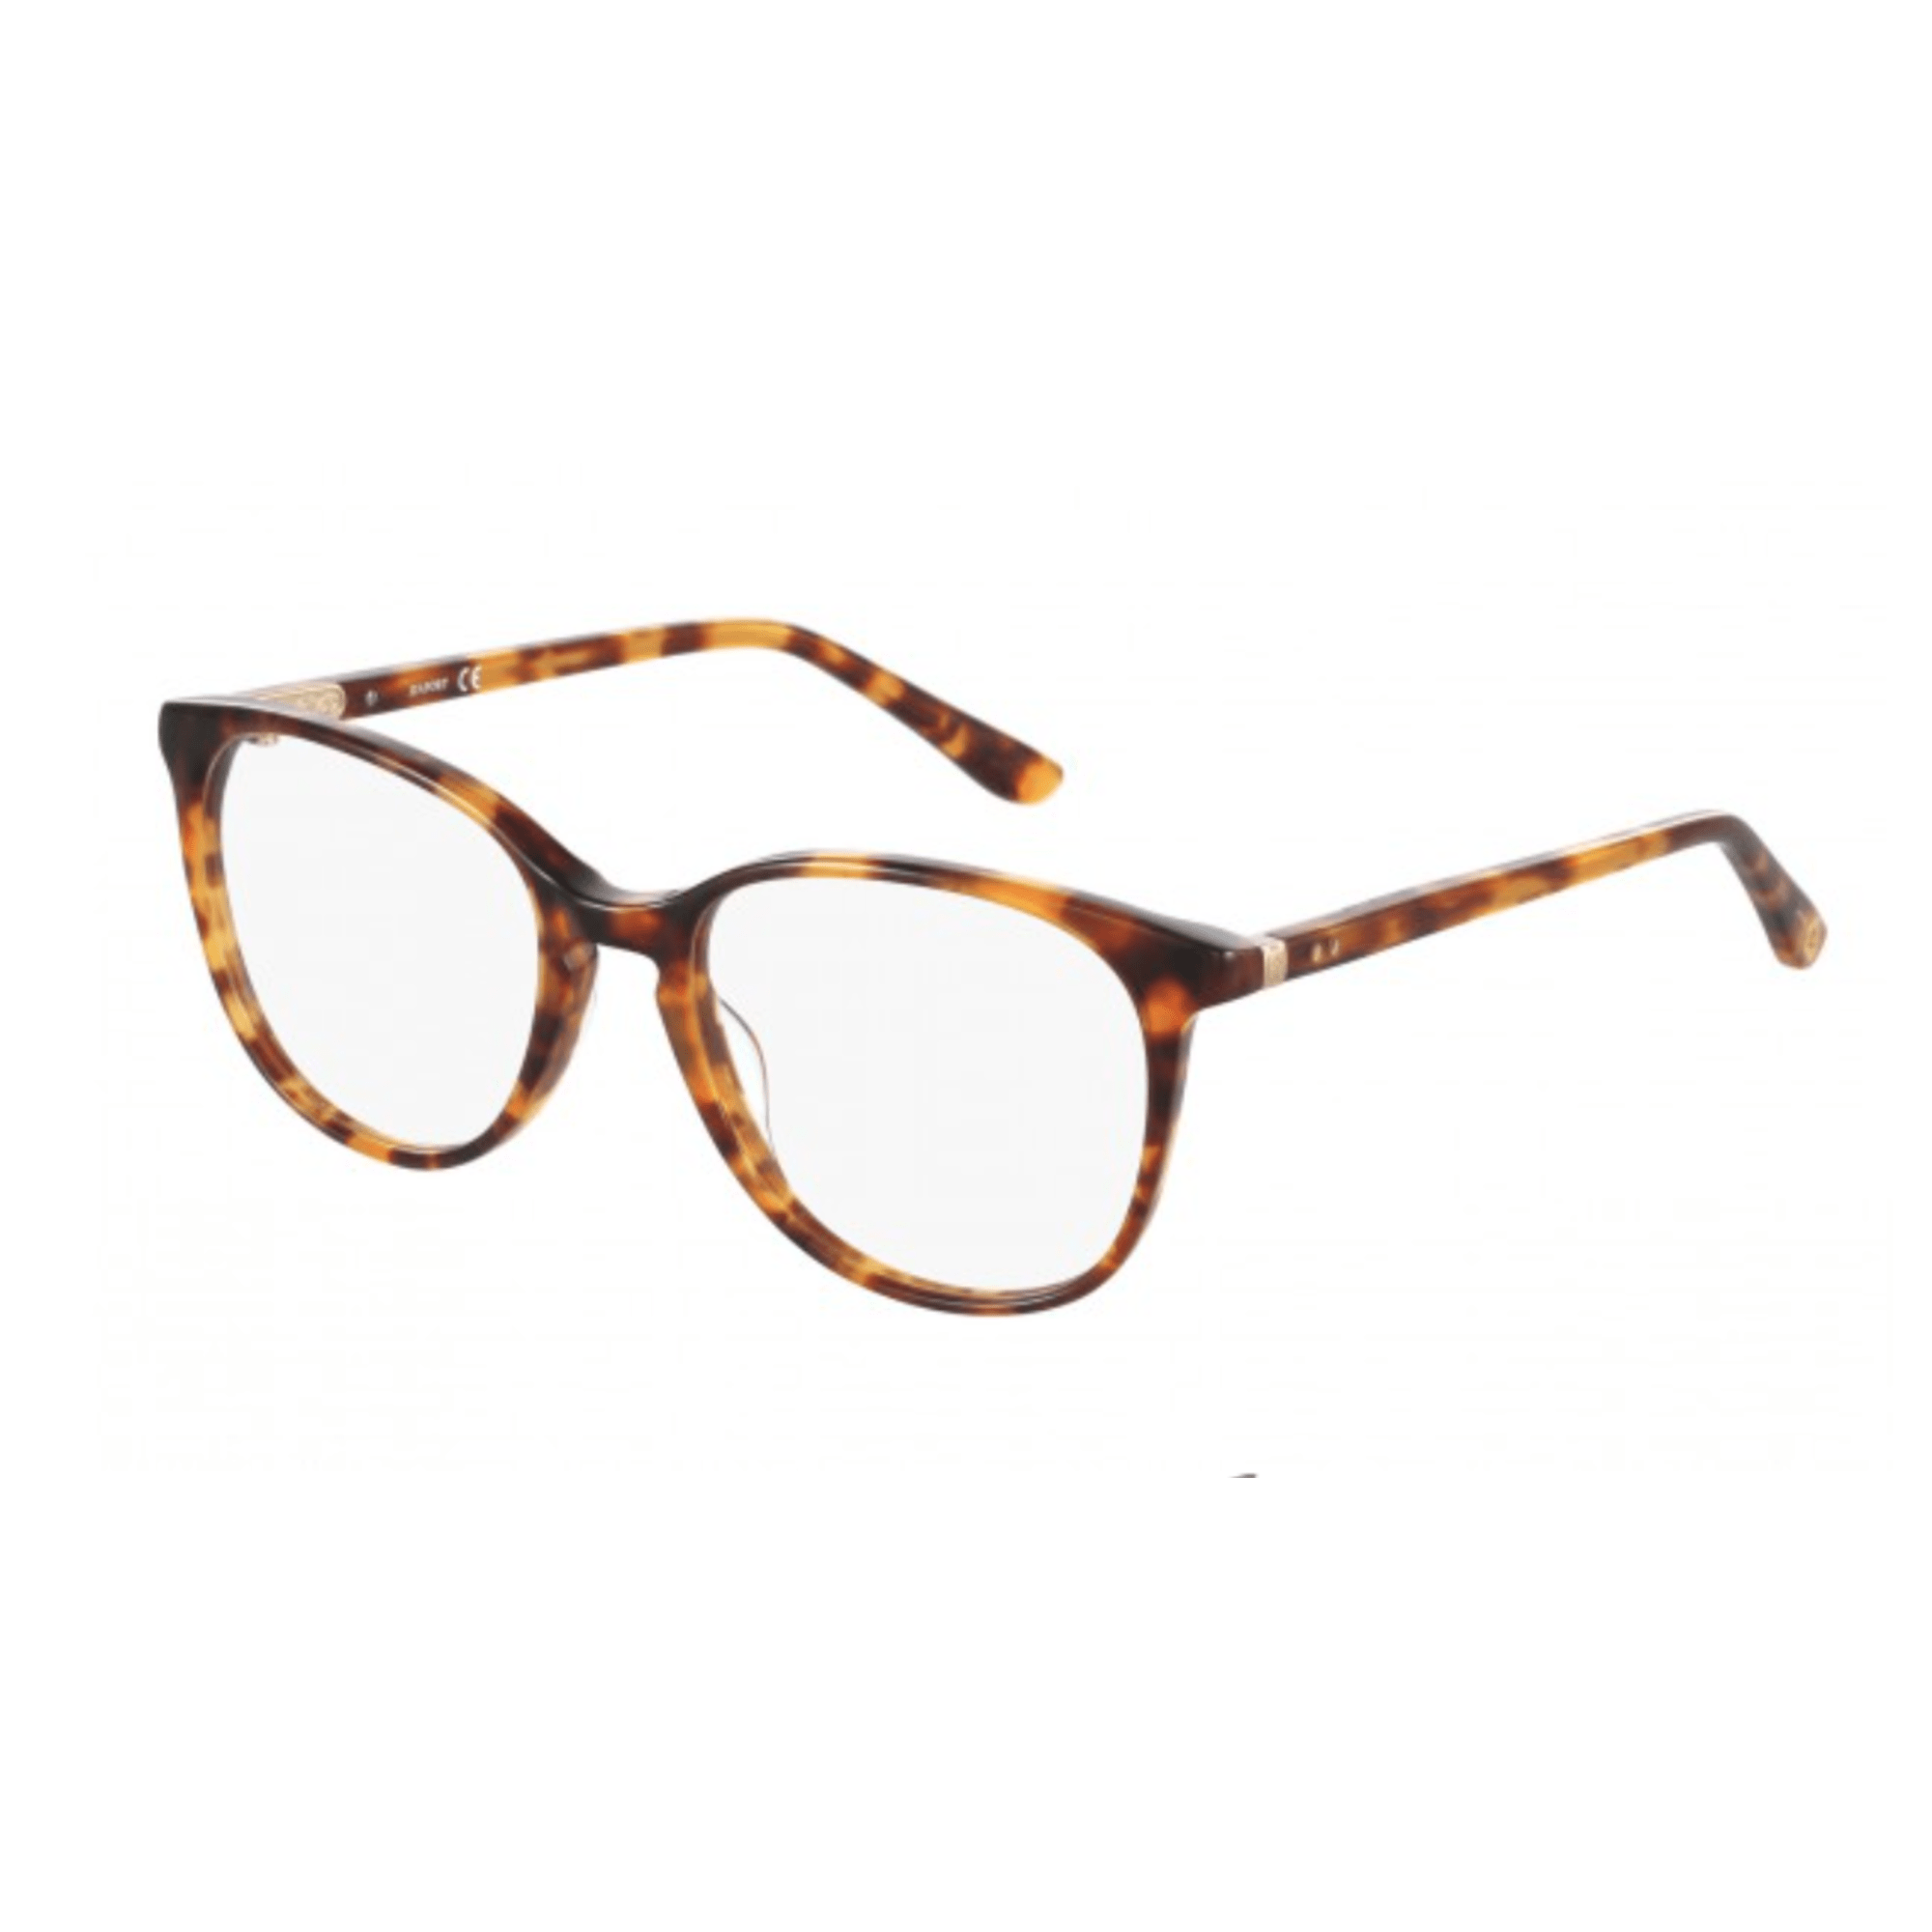 brand new 3984f 25e26 Montatura occhiali PAUL & JOE